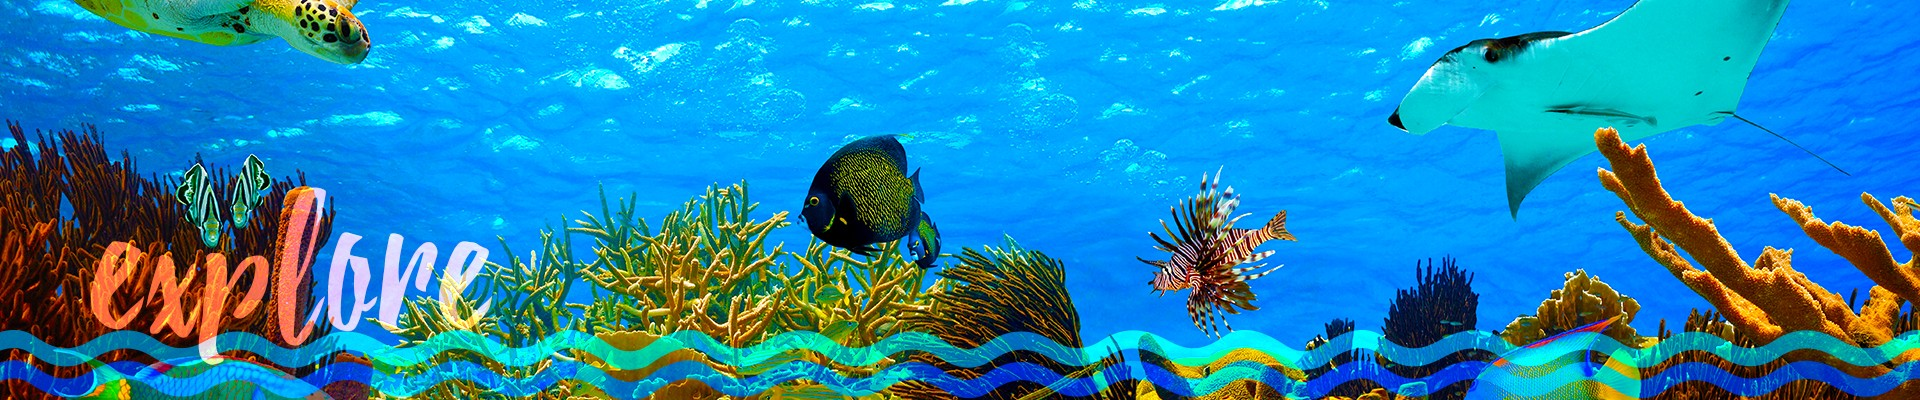 explore - John Pennekamp Coral Reef State Park